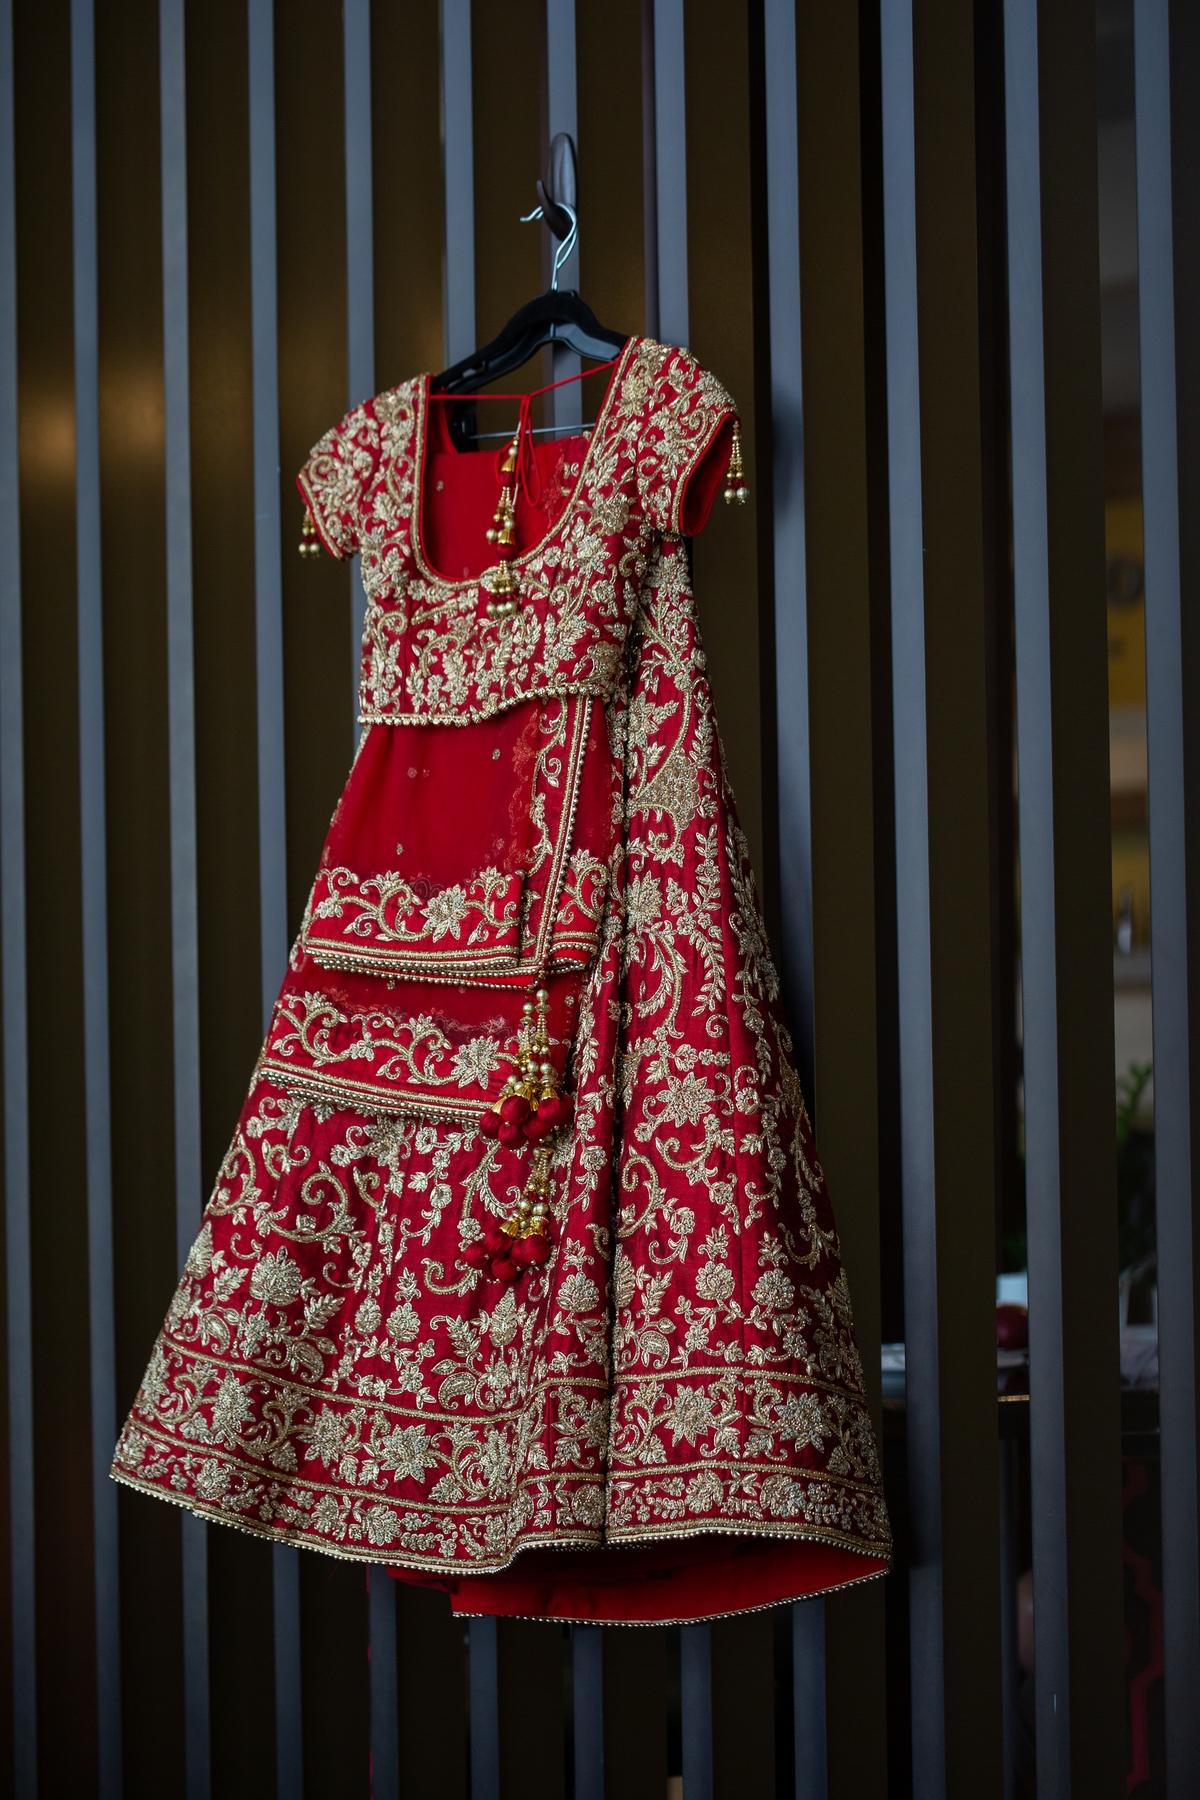 Le Cape Weddings - South Asian Wedding - Chicago Wedding Photographer P&V-12.jpg